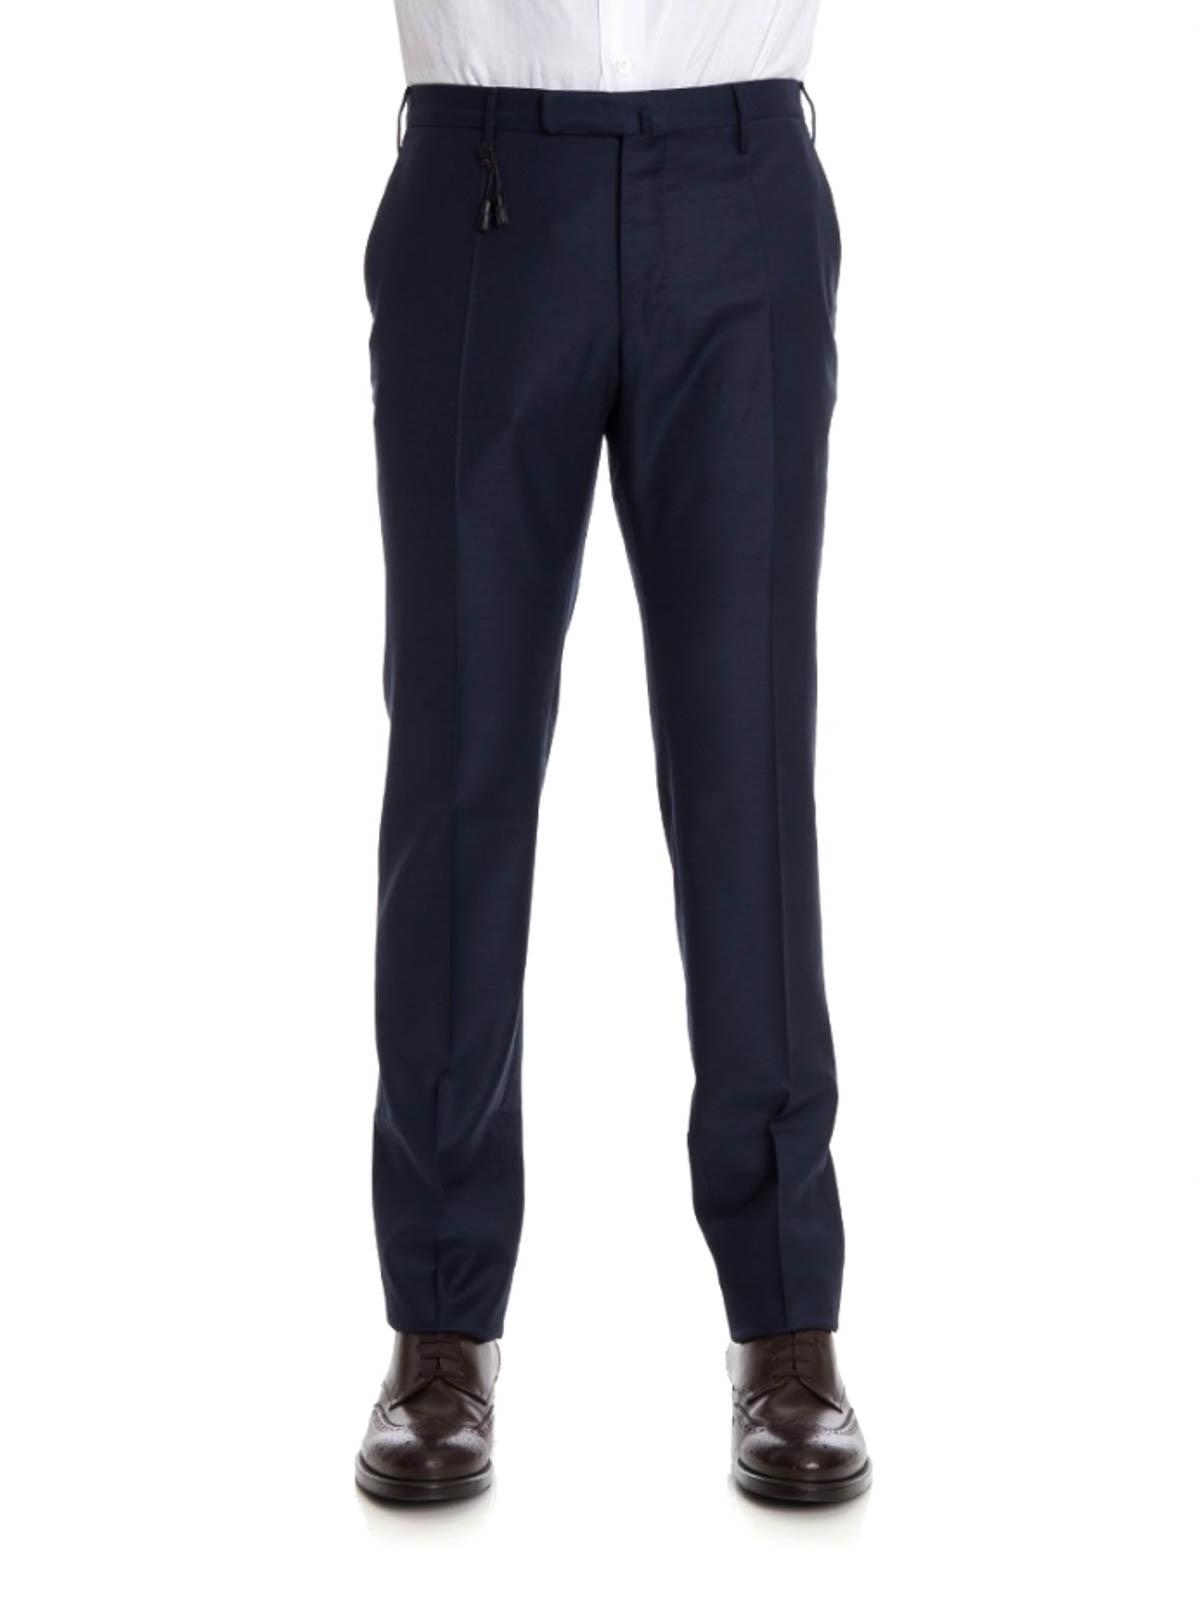 6934552612 INCOTEX  Pantalones de sastrerìa online - Pantalón De Vestir Azul Para  Hombre